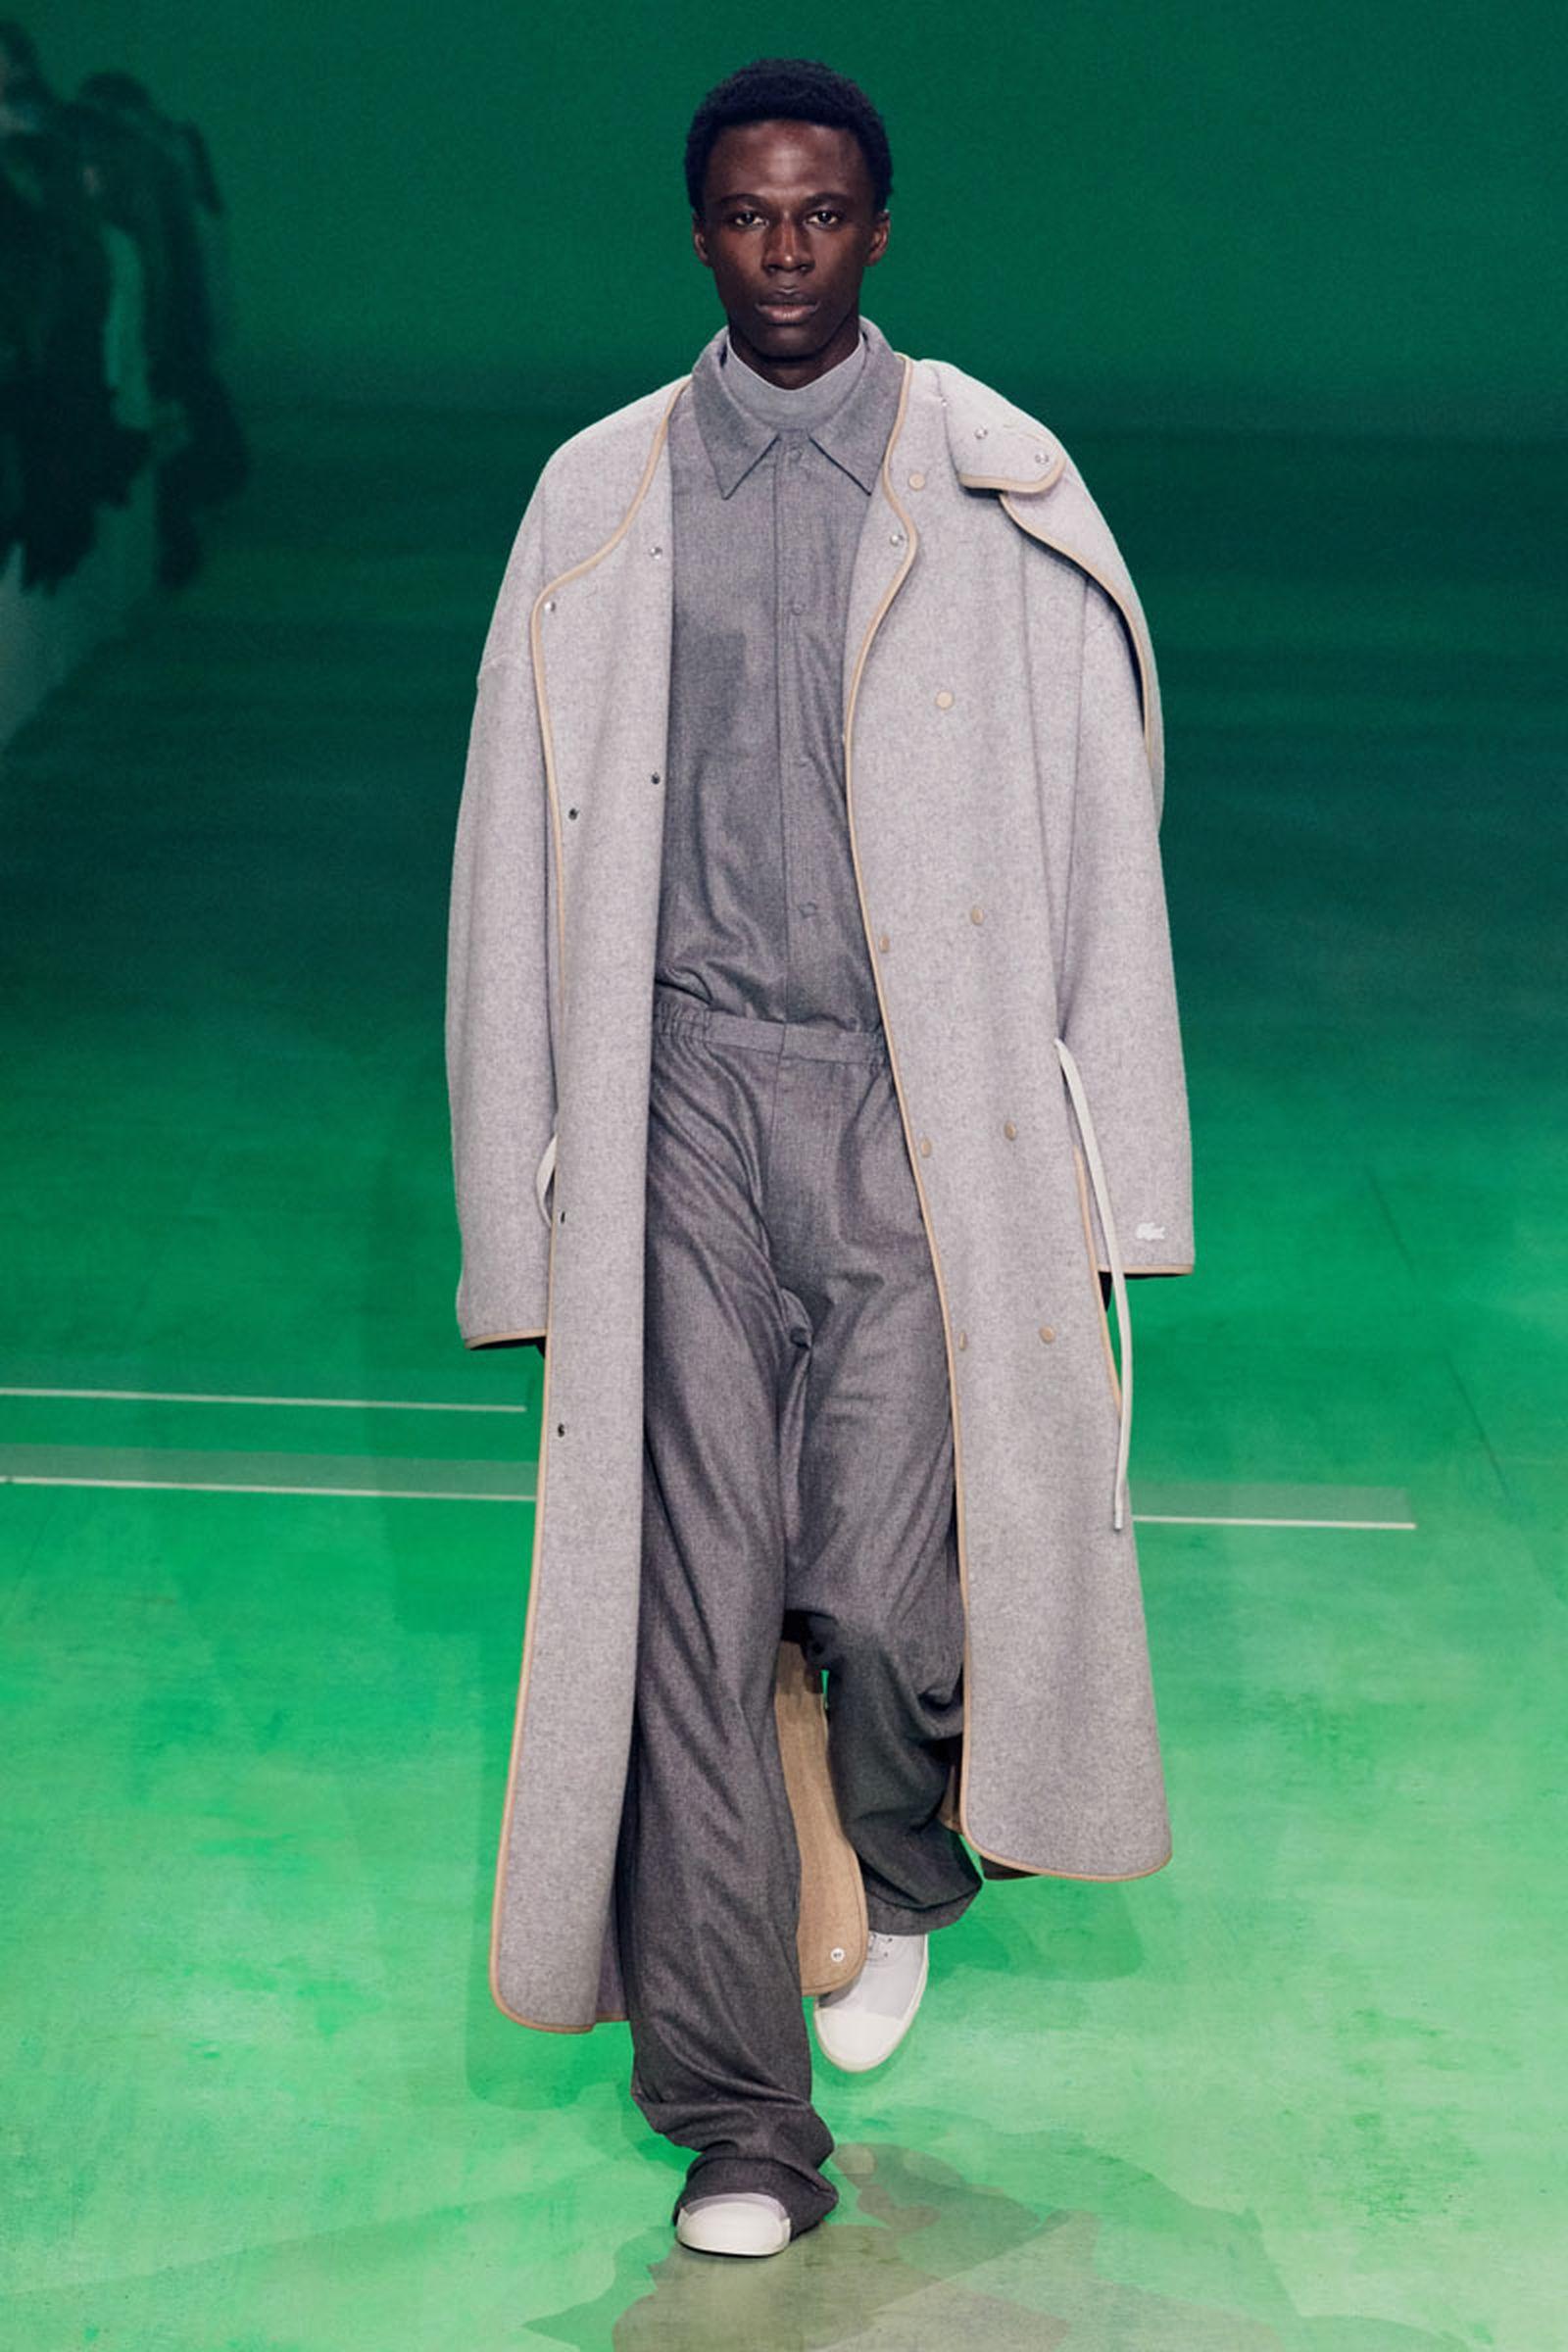 19lascoste fw19 paris fashion week Louise Trotter lacoste runway